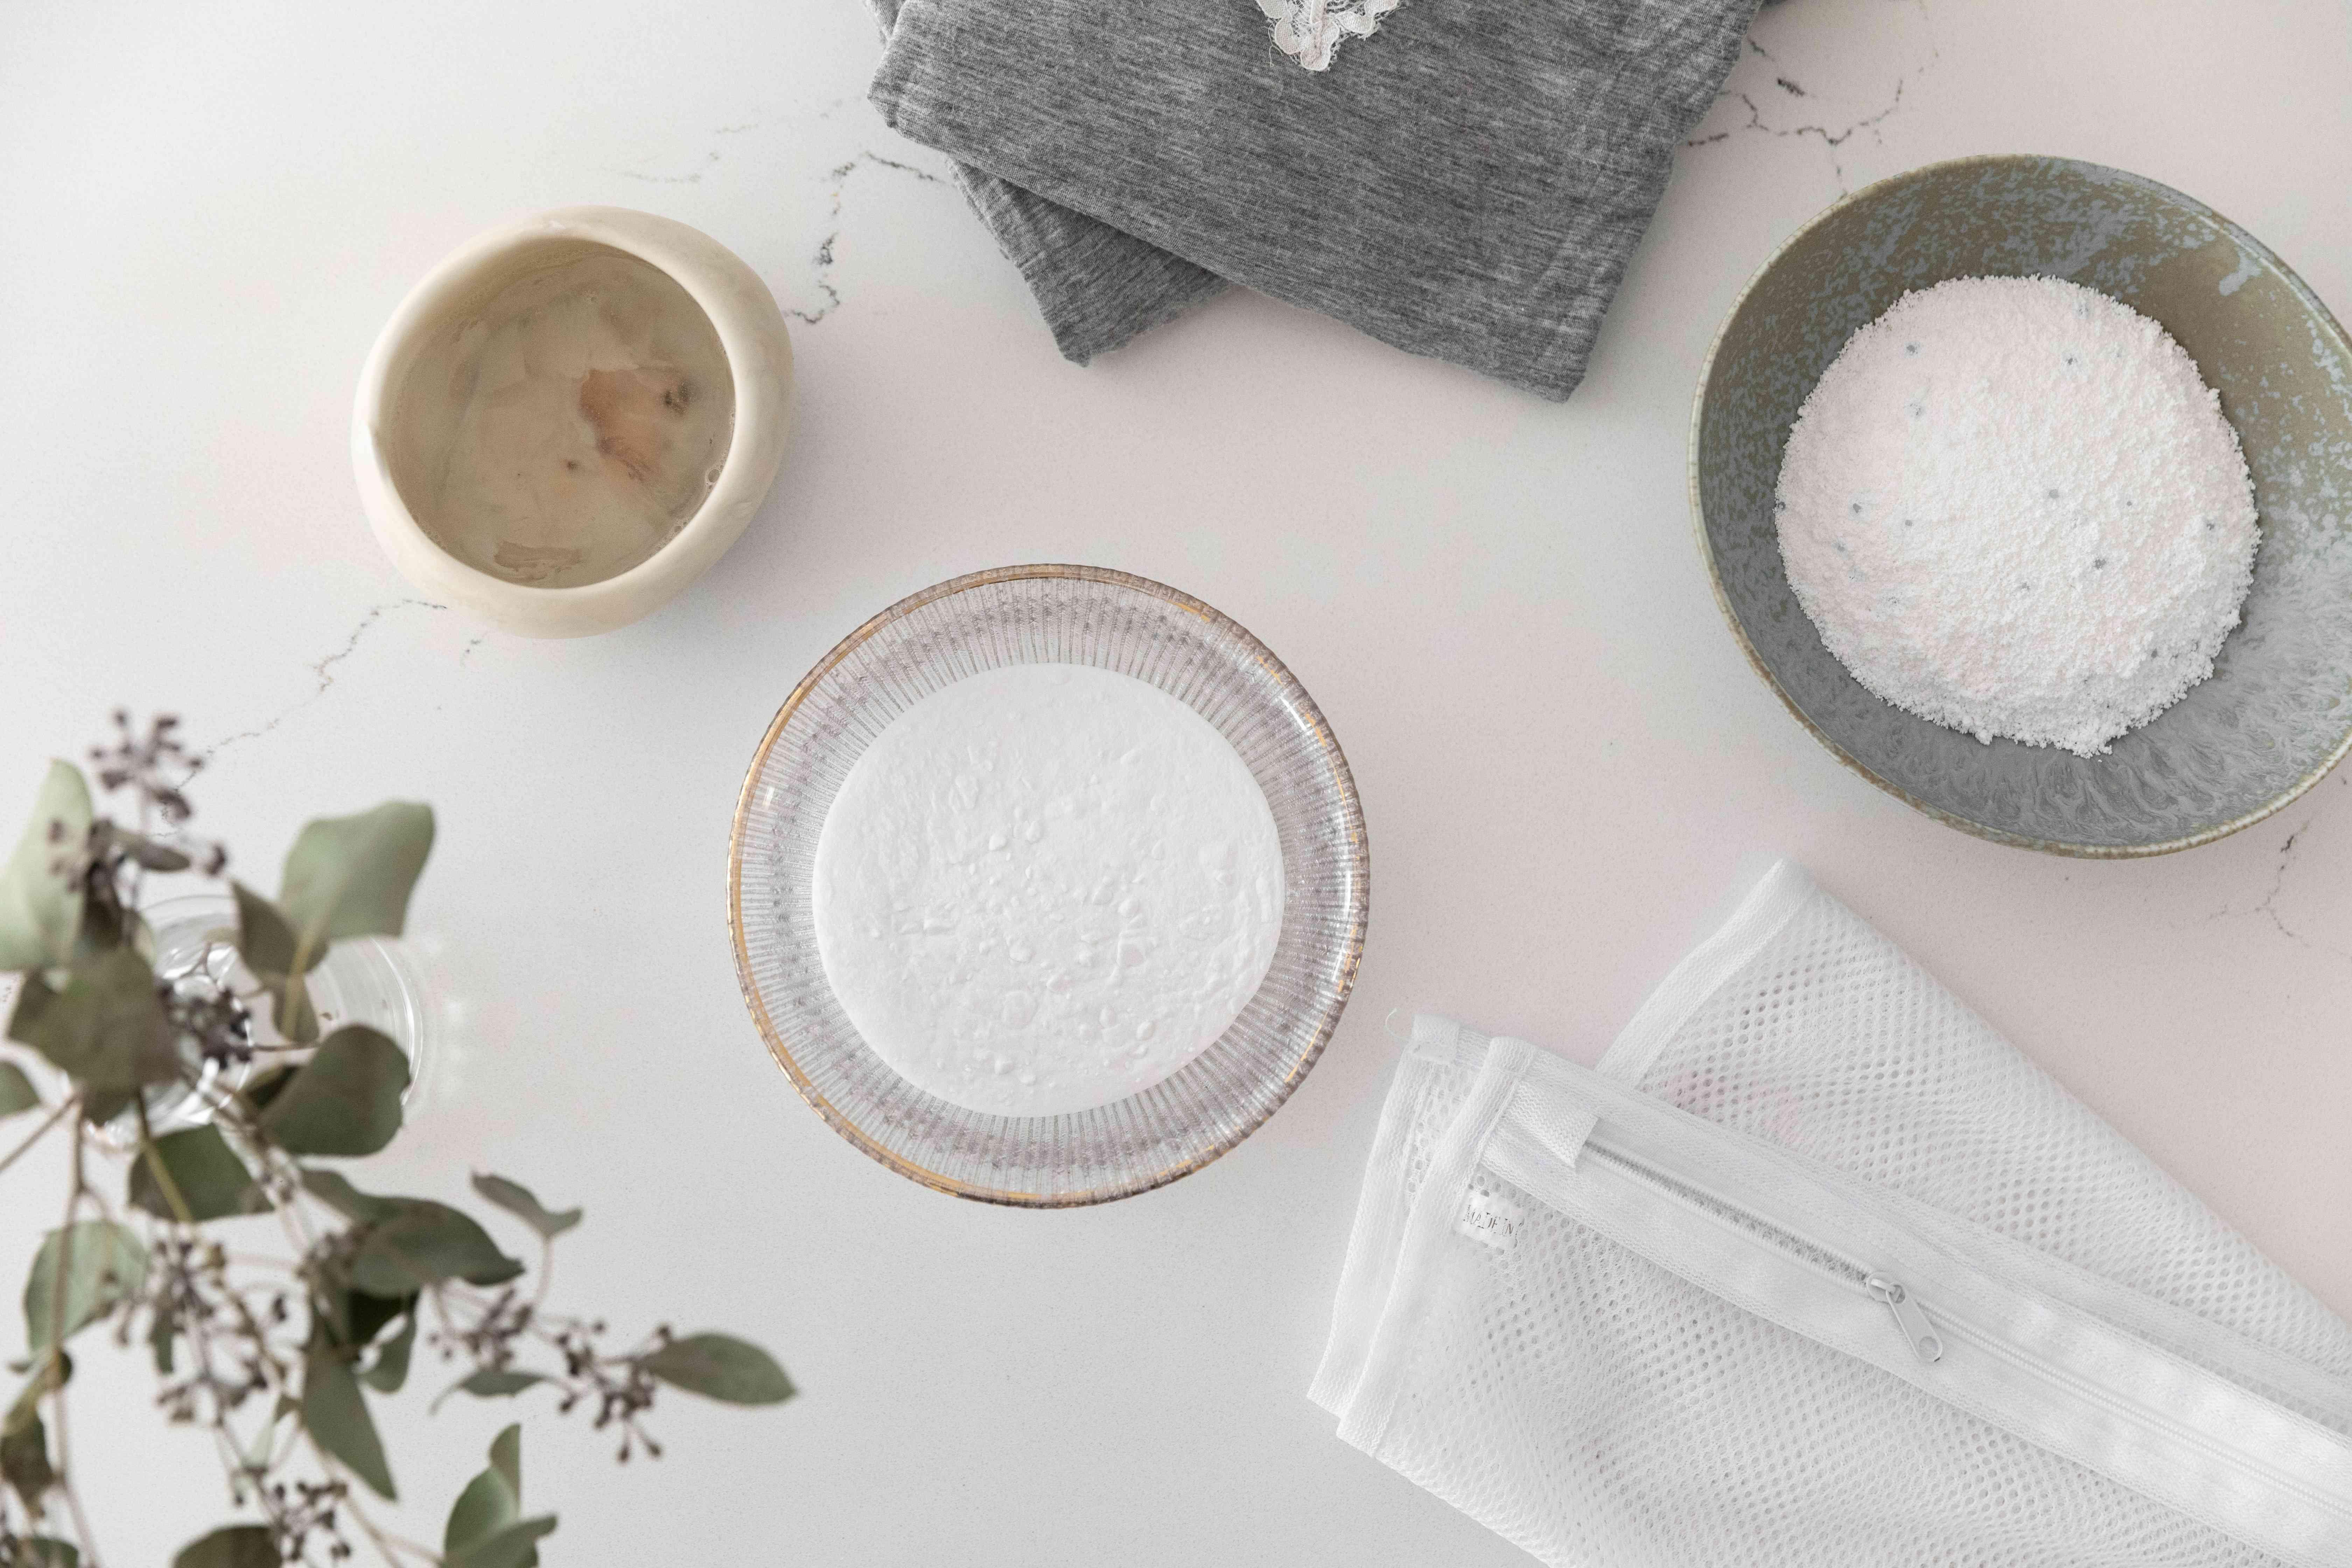 Ingredients for washing modal clothing